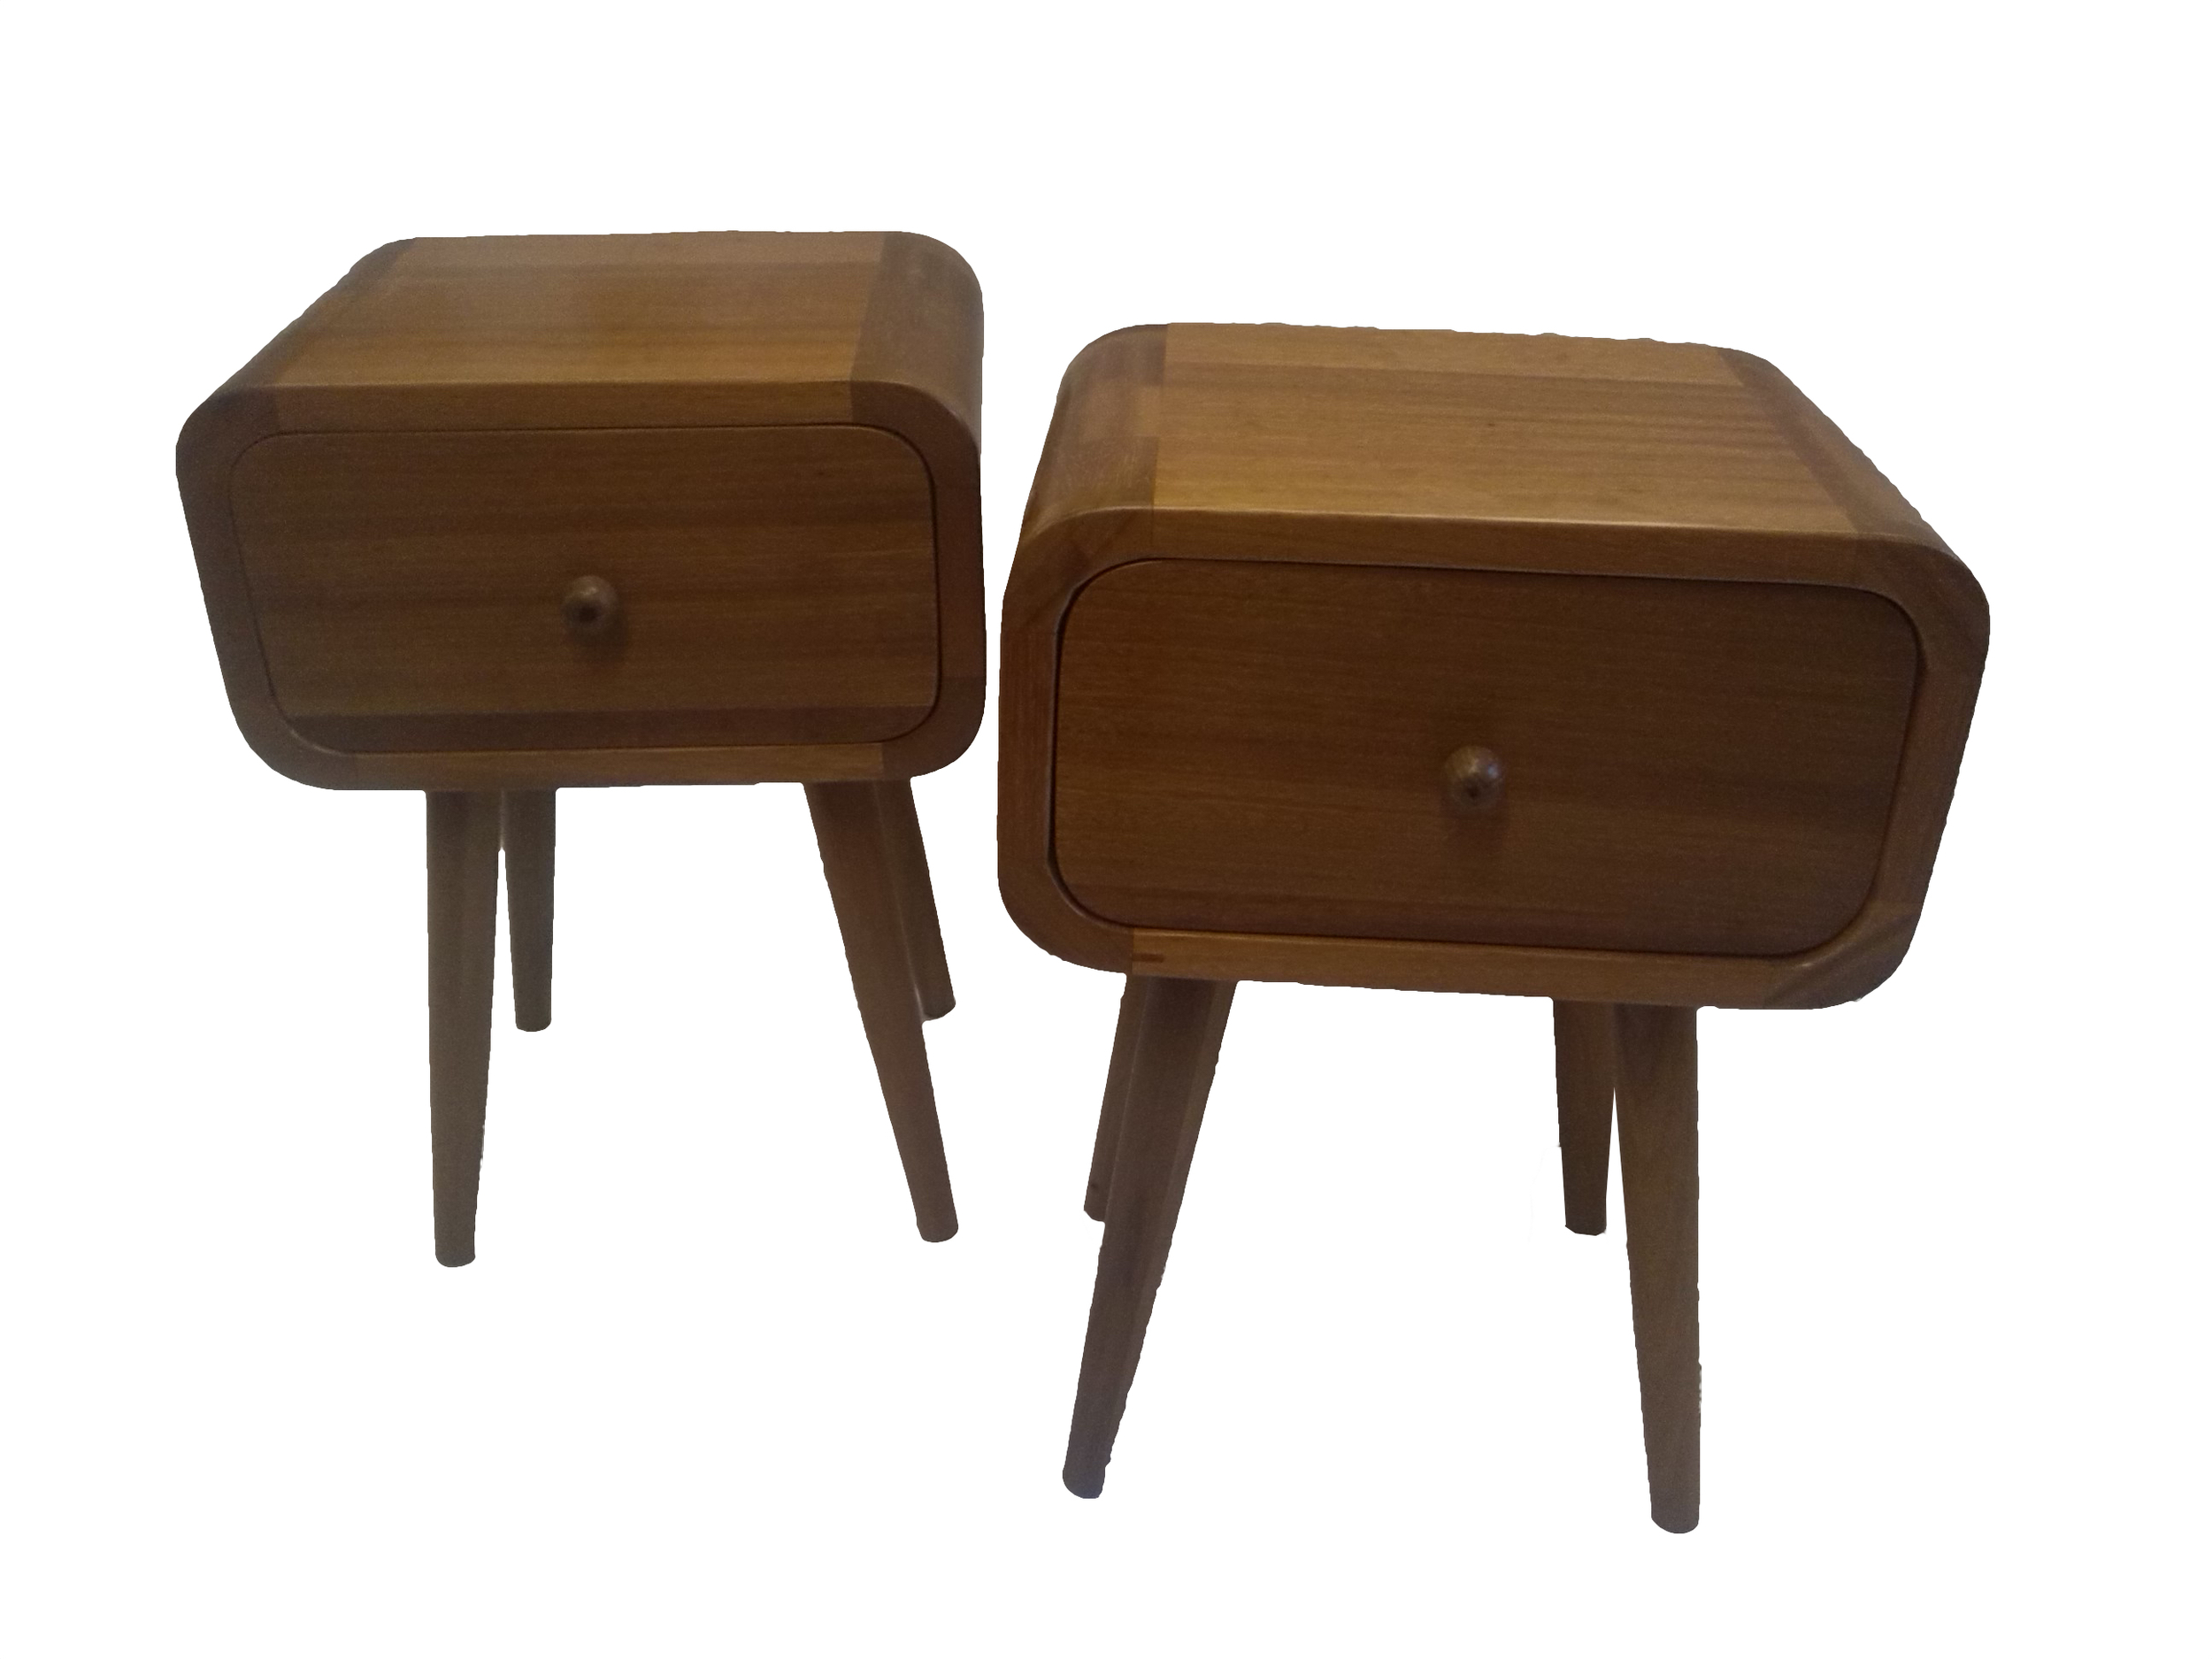 Retro bedside tables